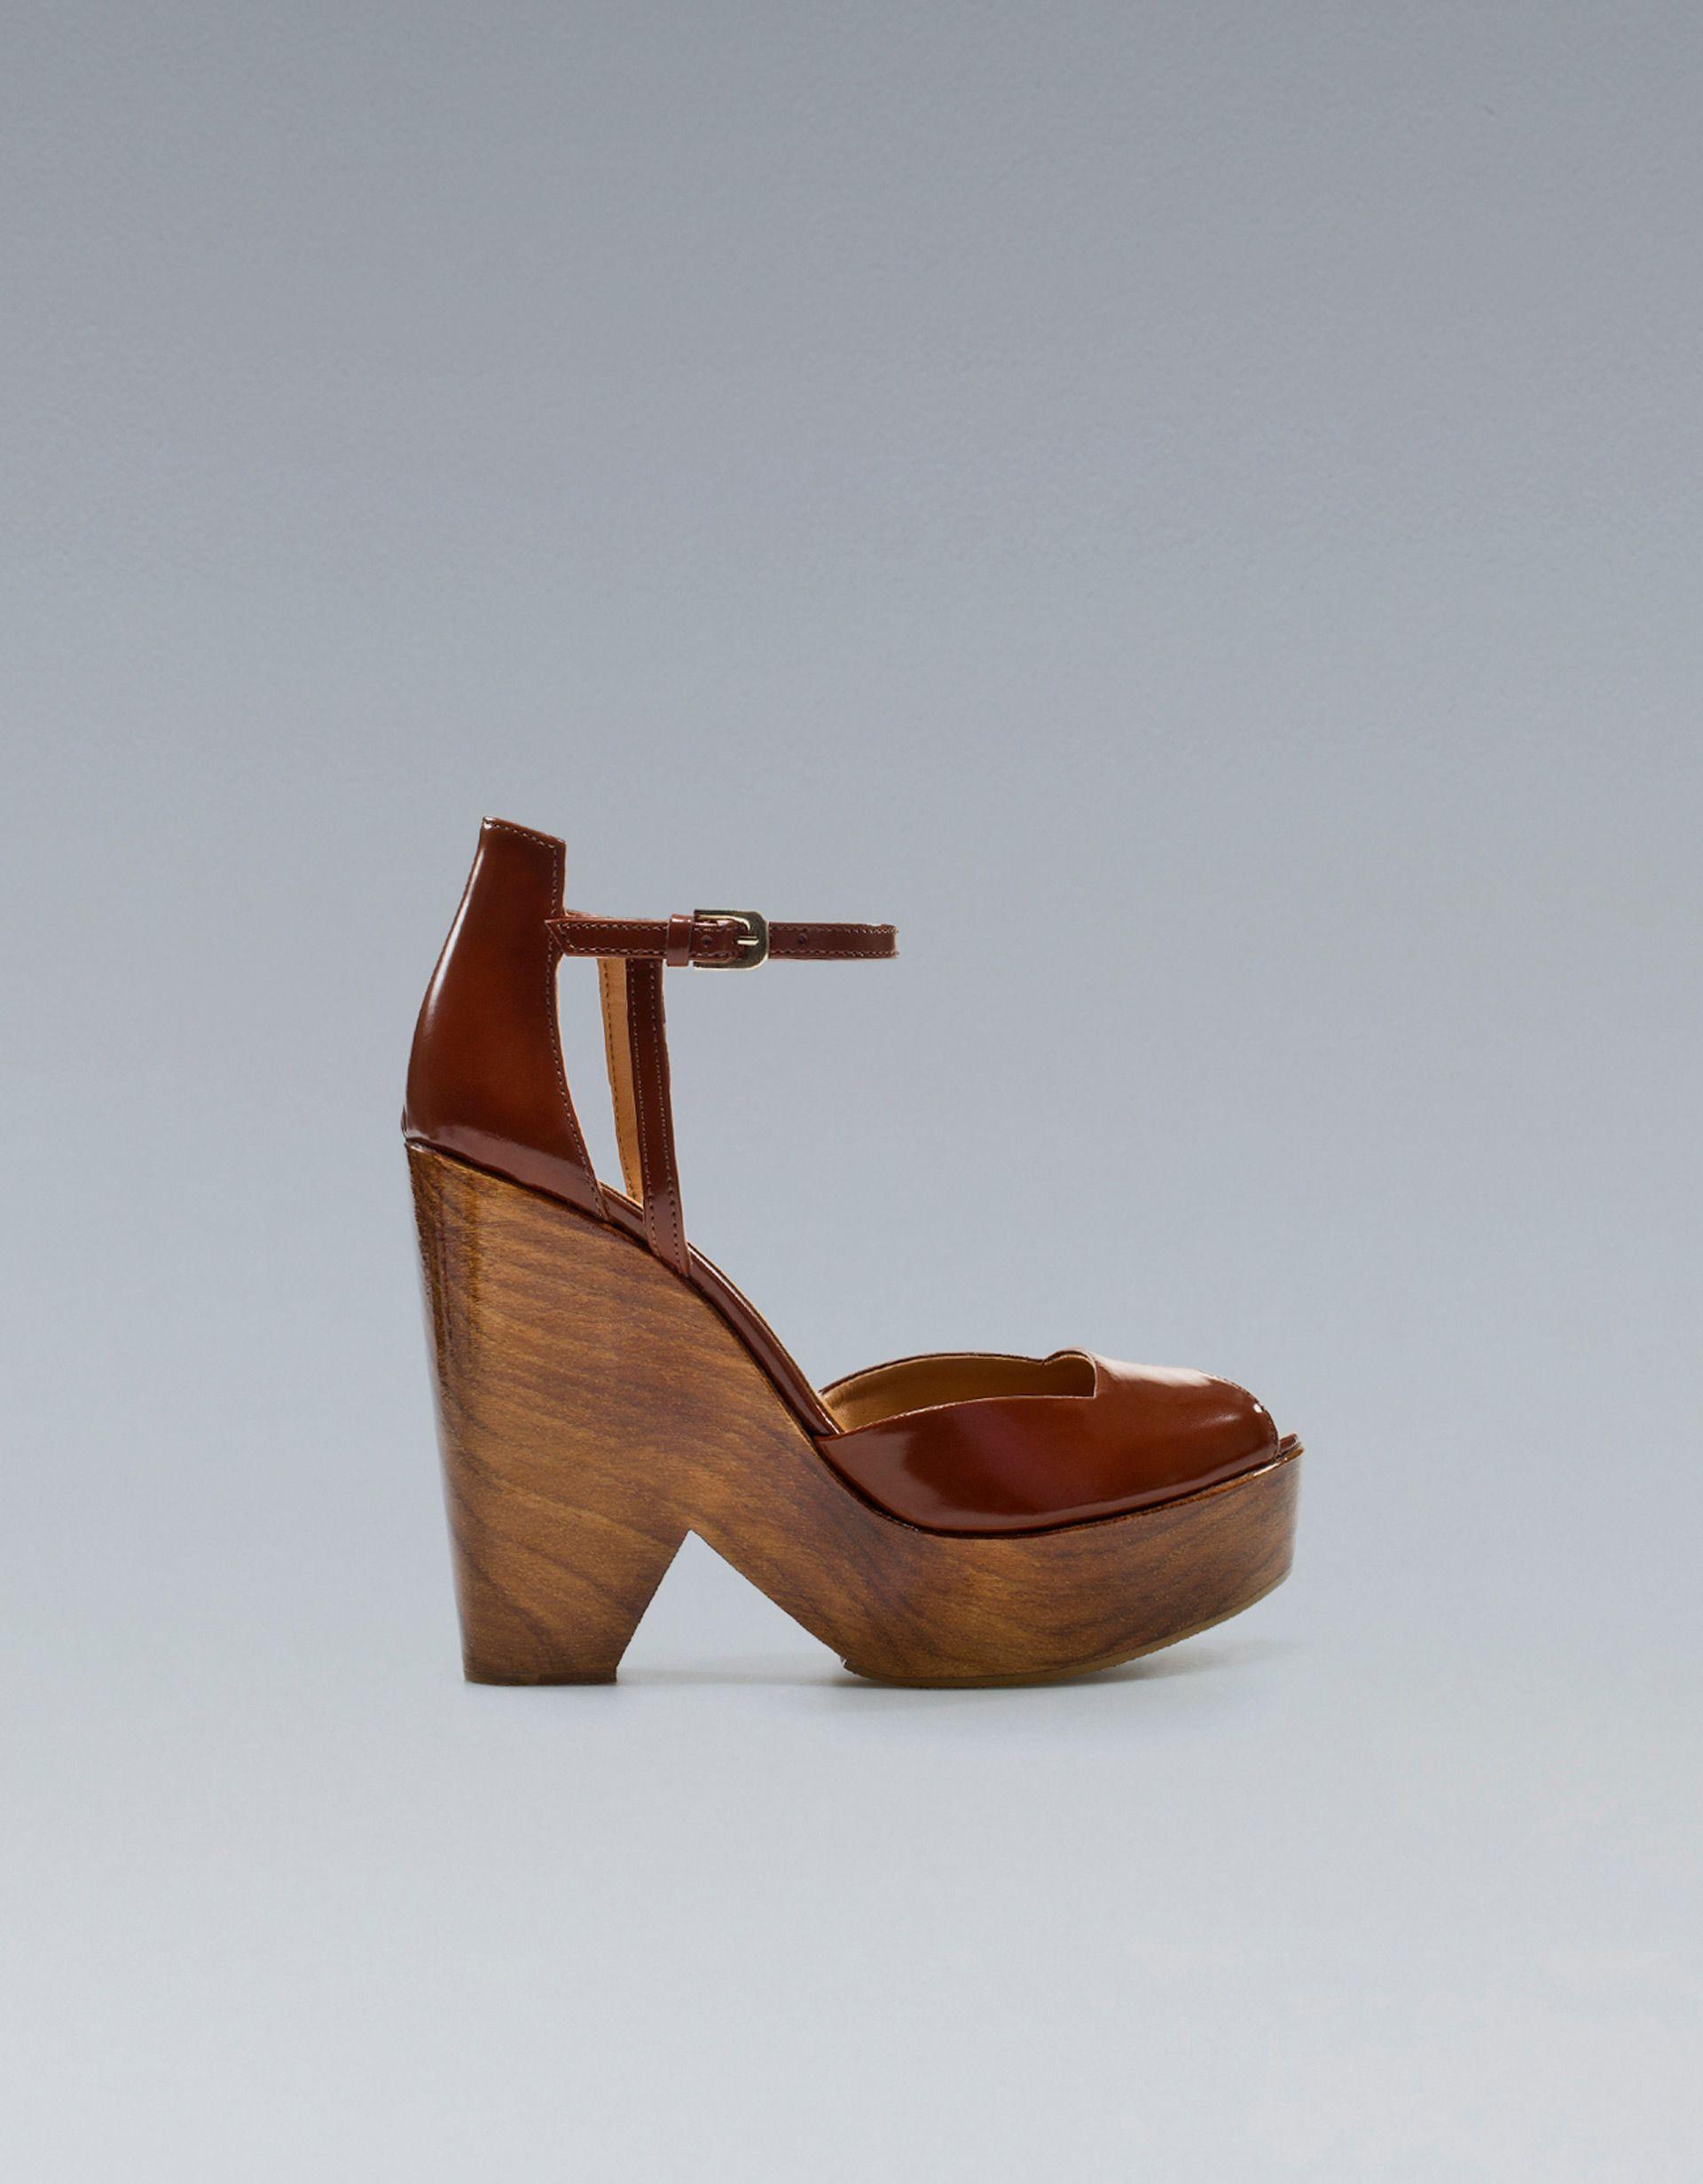 Chaussure Bois Talon 69 Euros Compensé À Zara Antic 95 En xordCeB